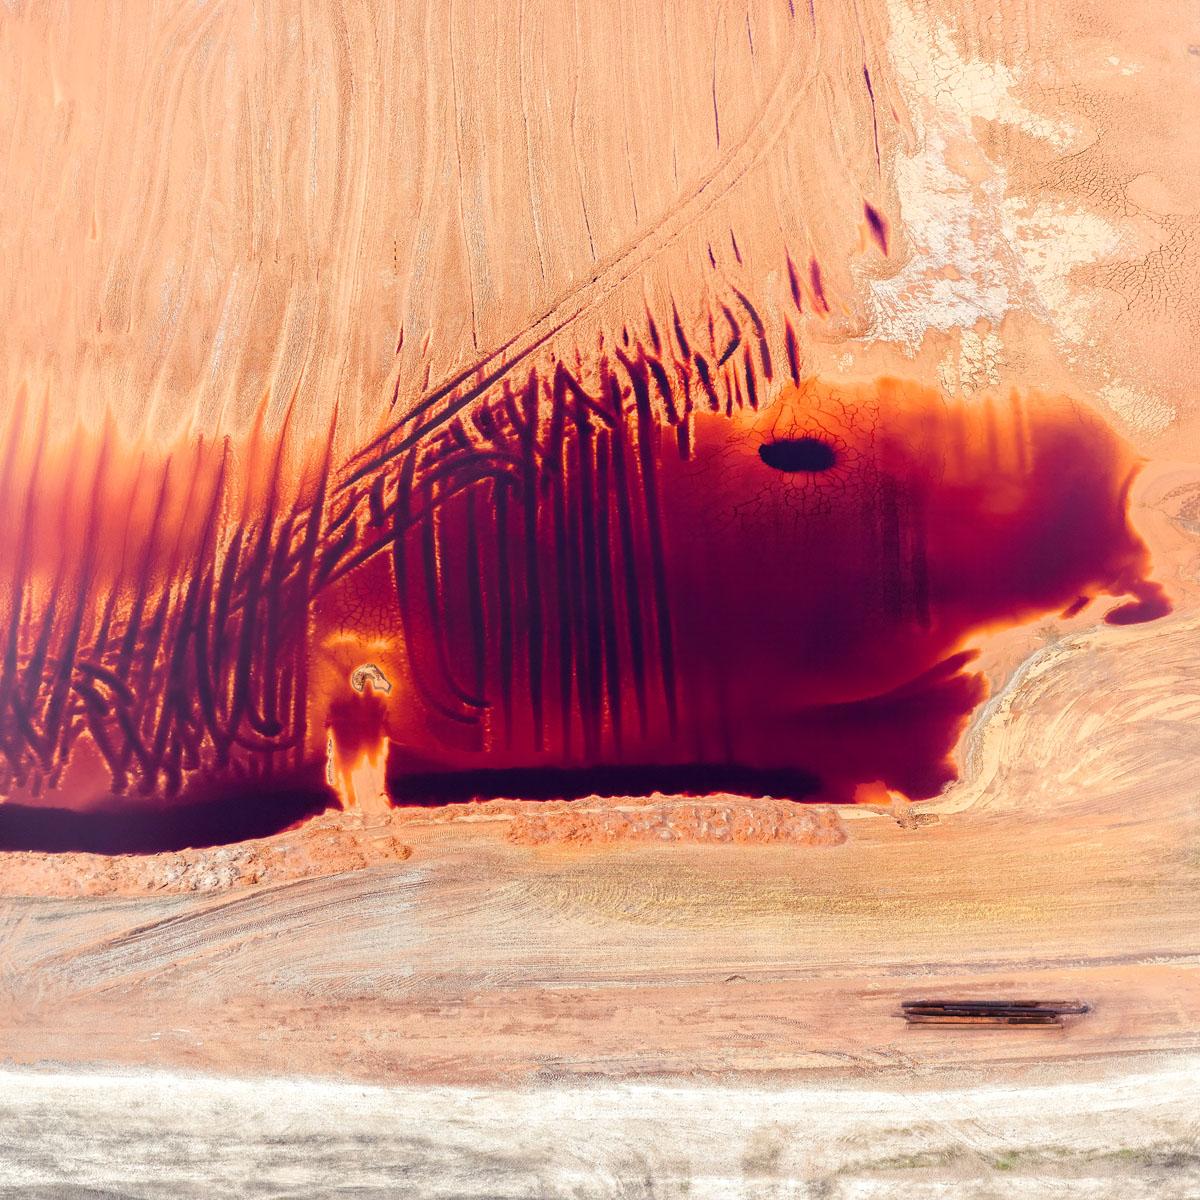 Chris Saunders - 'Aerial Alcoa 003'